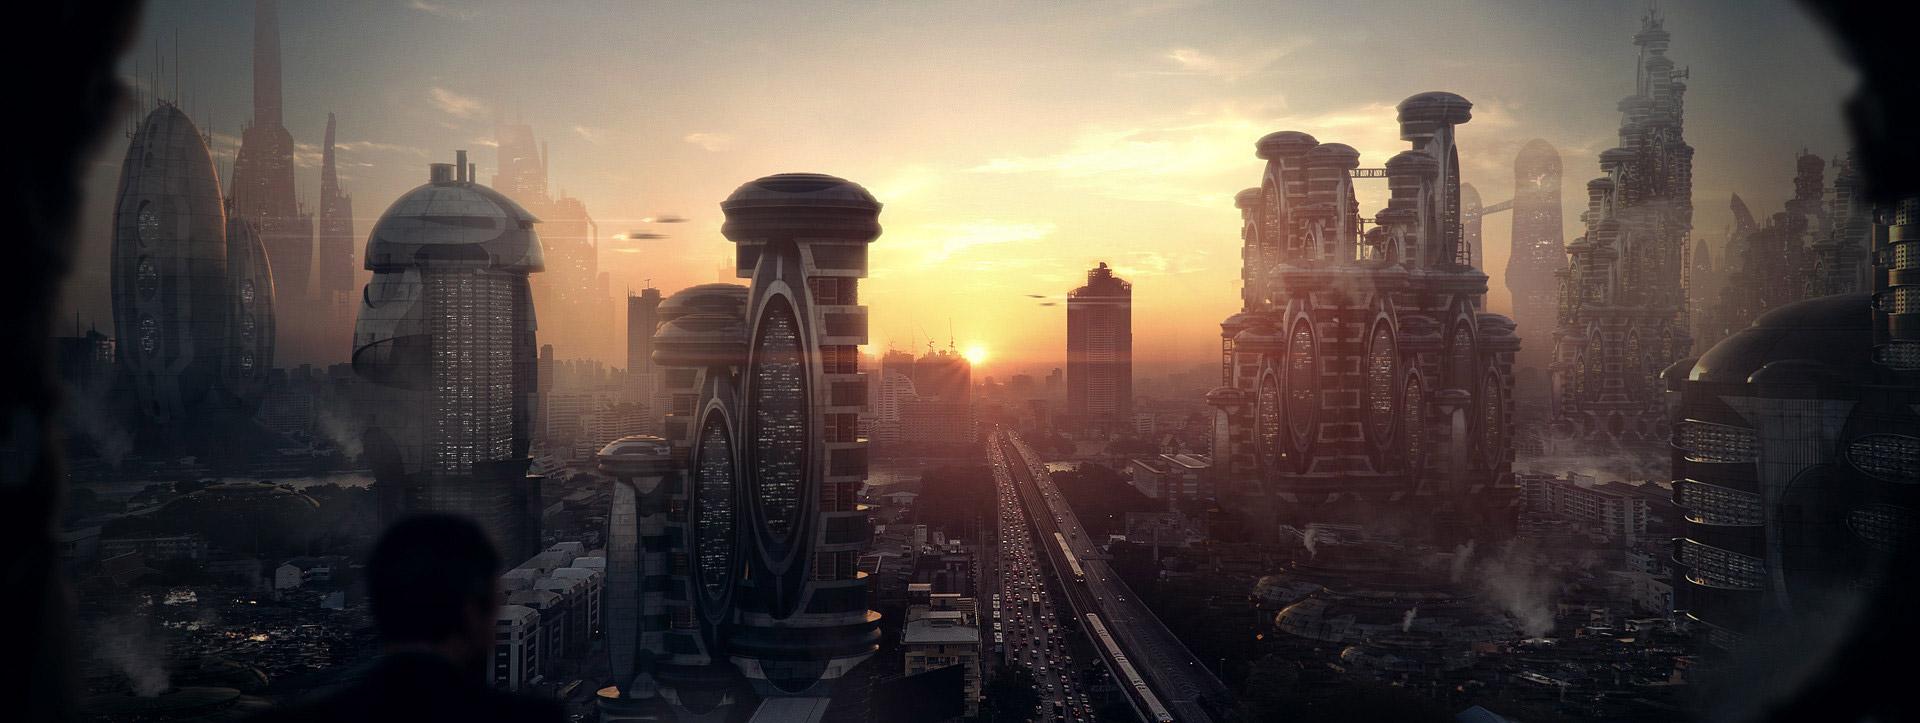 The Cinematic Sci-Fi Art of Michael Johnson